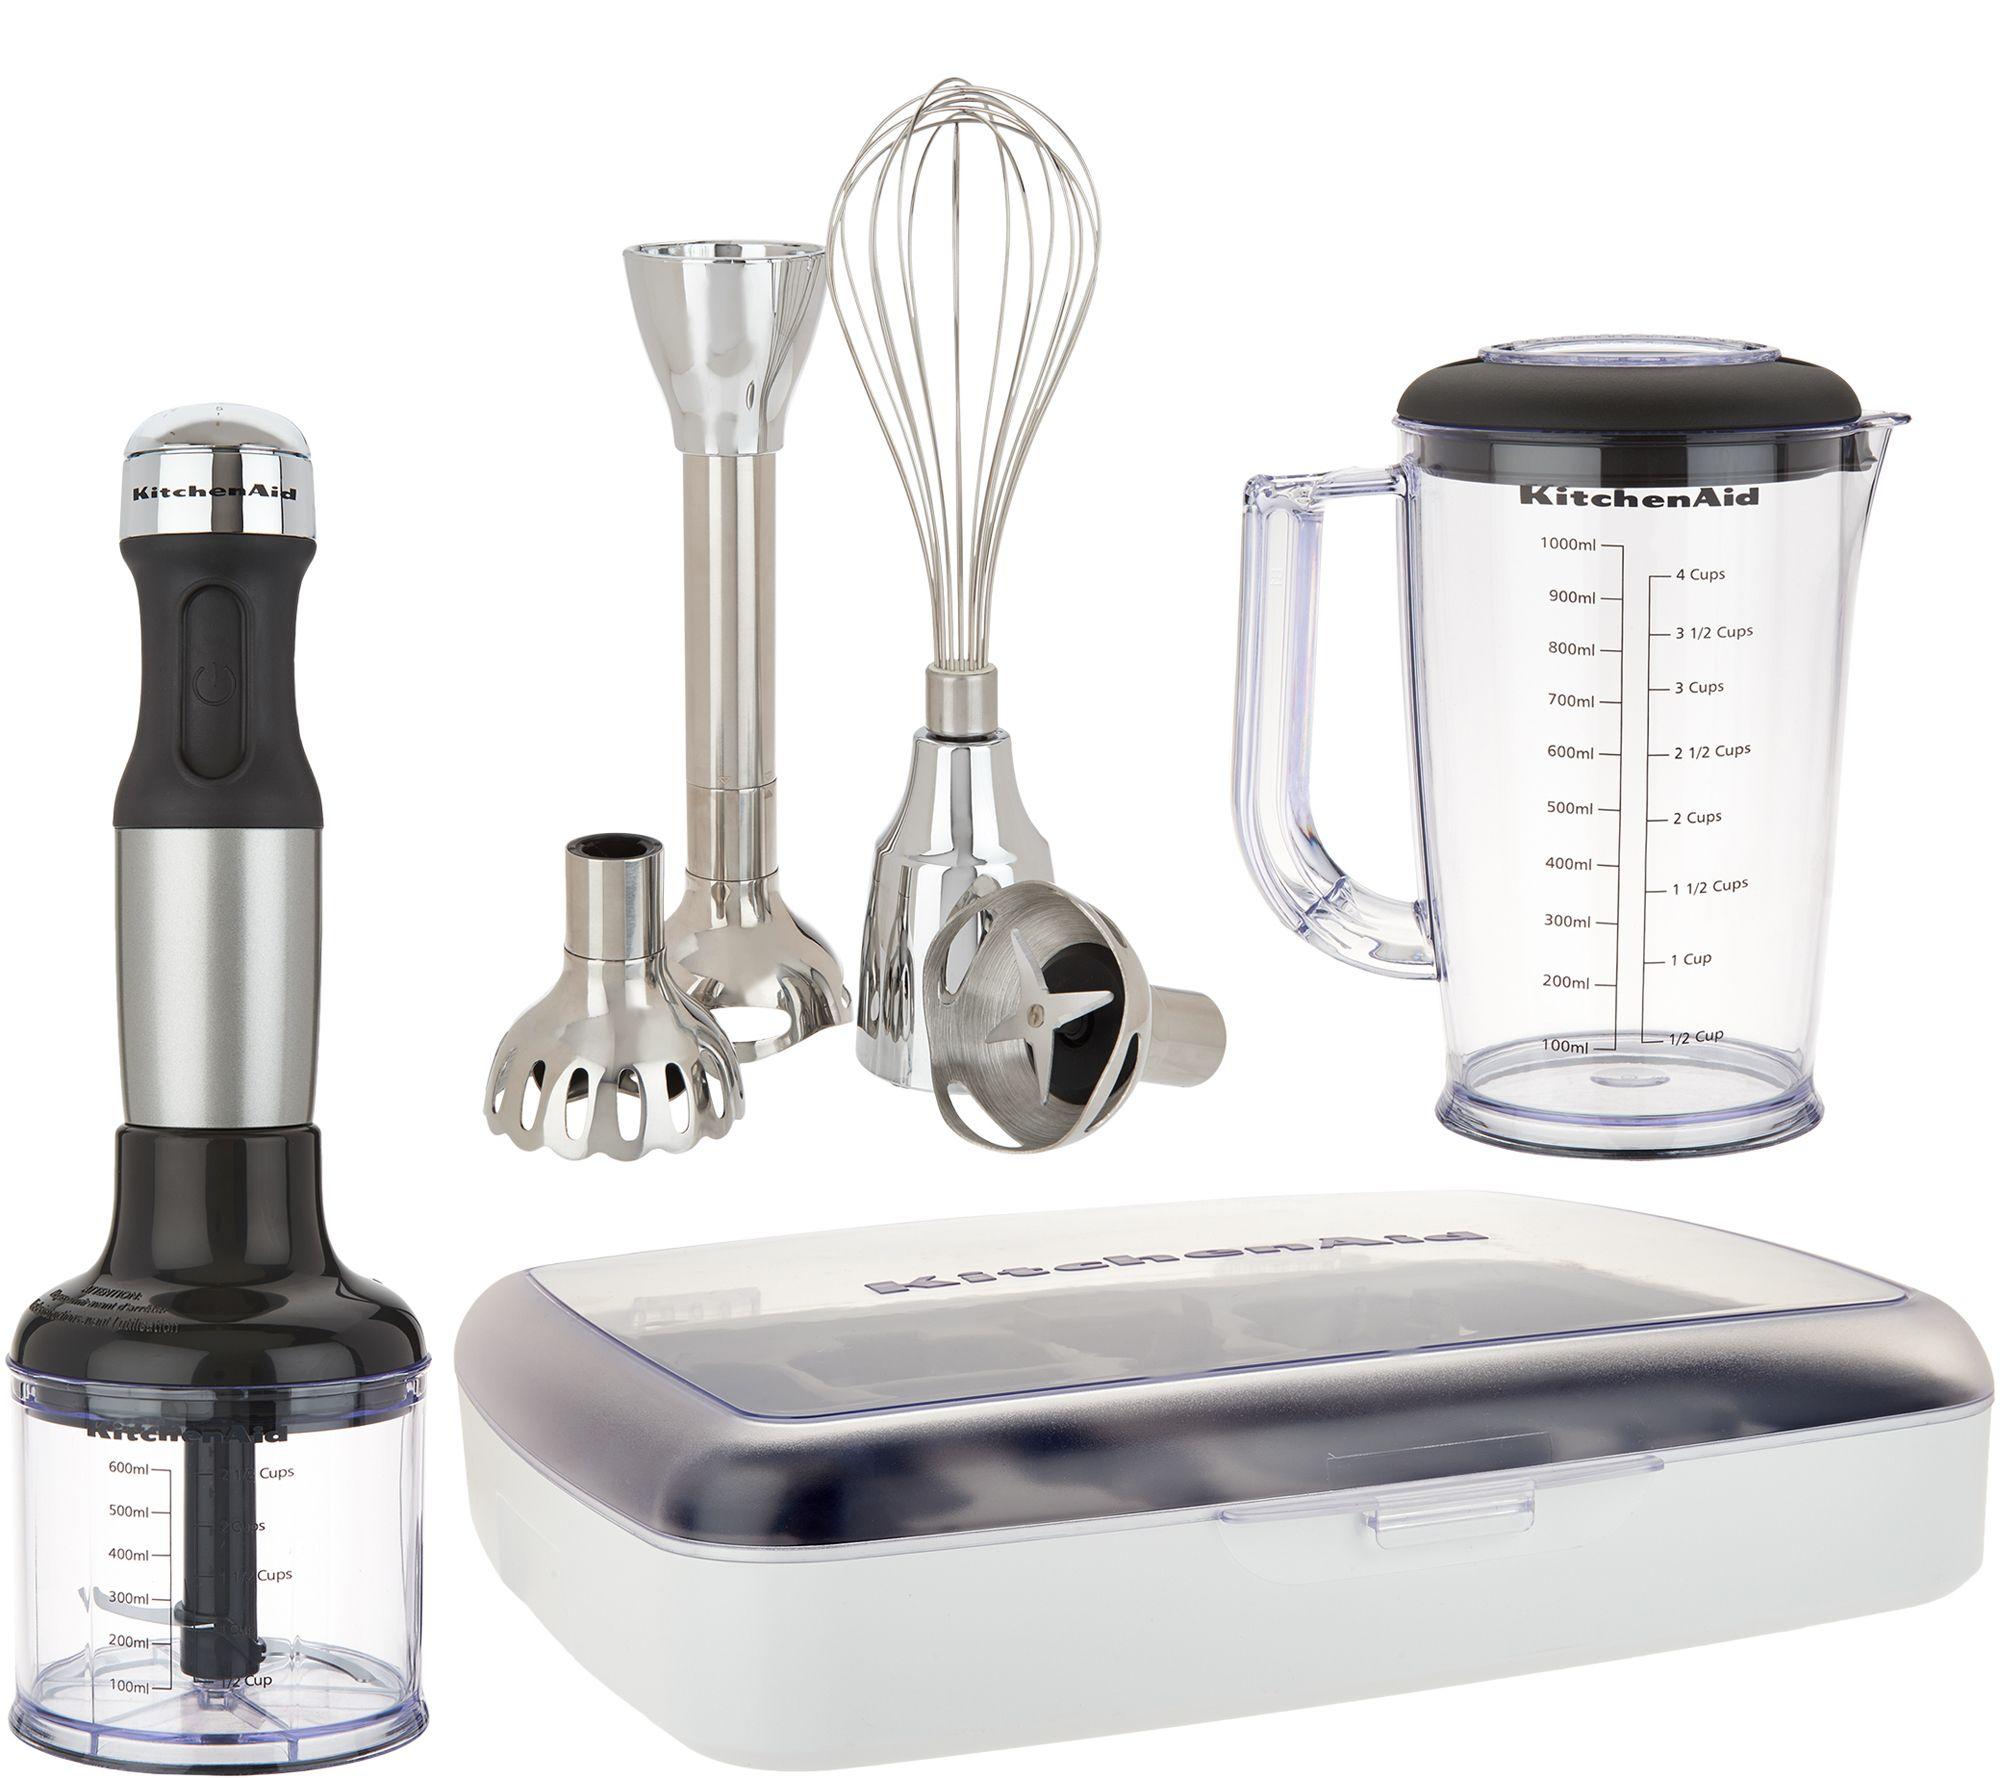 KitchenAid 5 Speed Hand Blender with Attachments and Storage Case